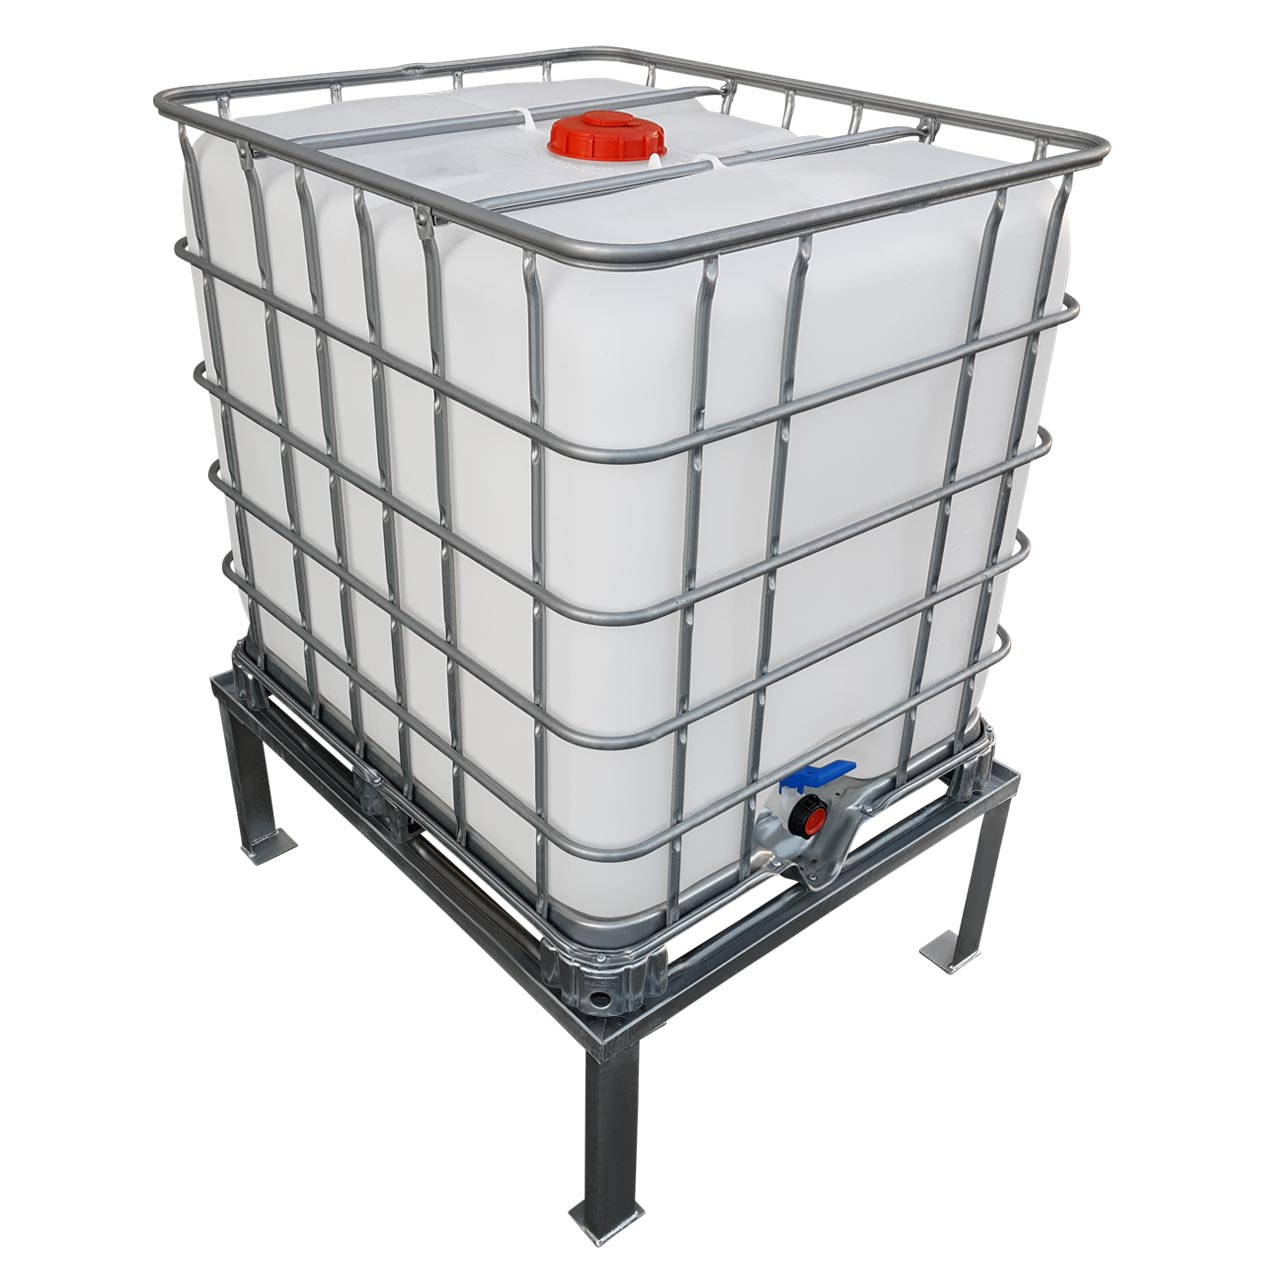 1000l ibc untergestell grundmodul podest f r container. Black Bedroom Furniture Sets. Home Design Ideas